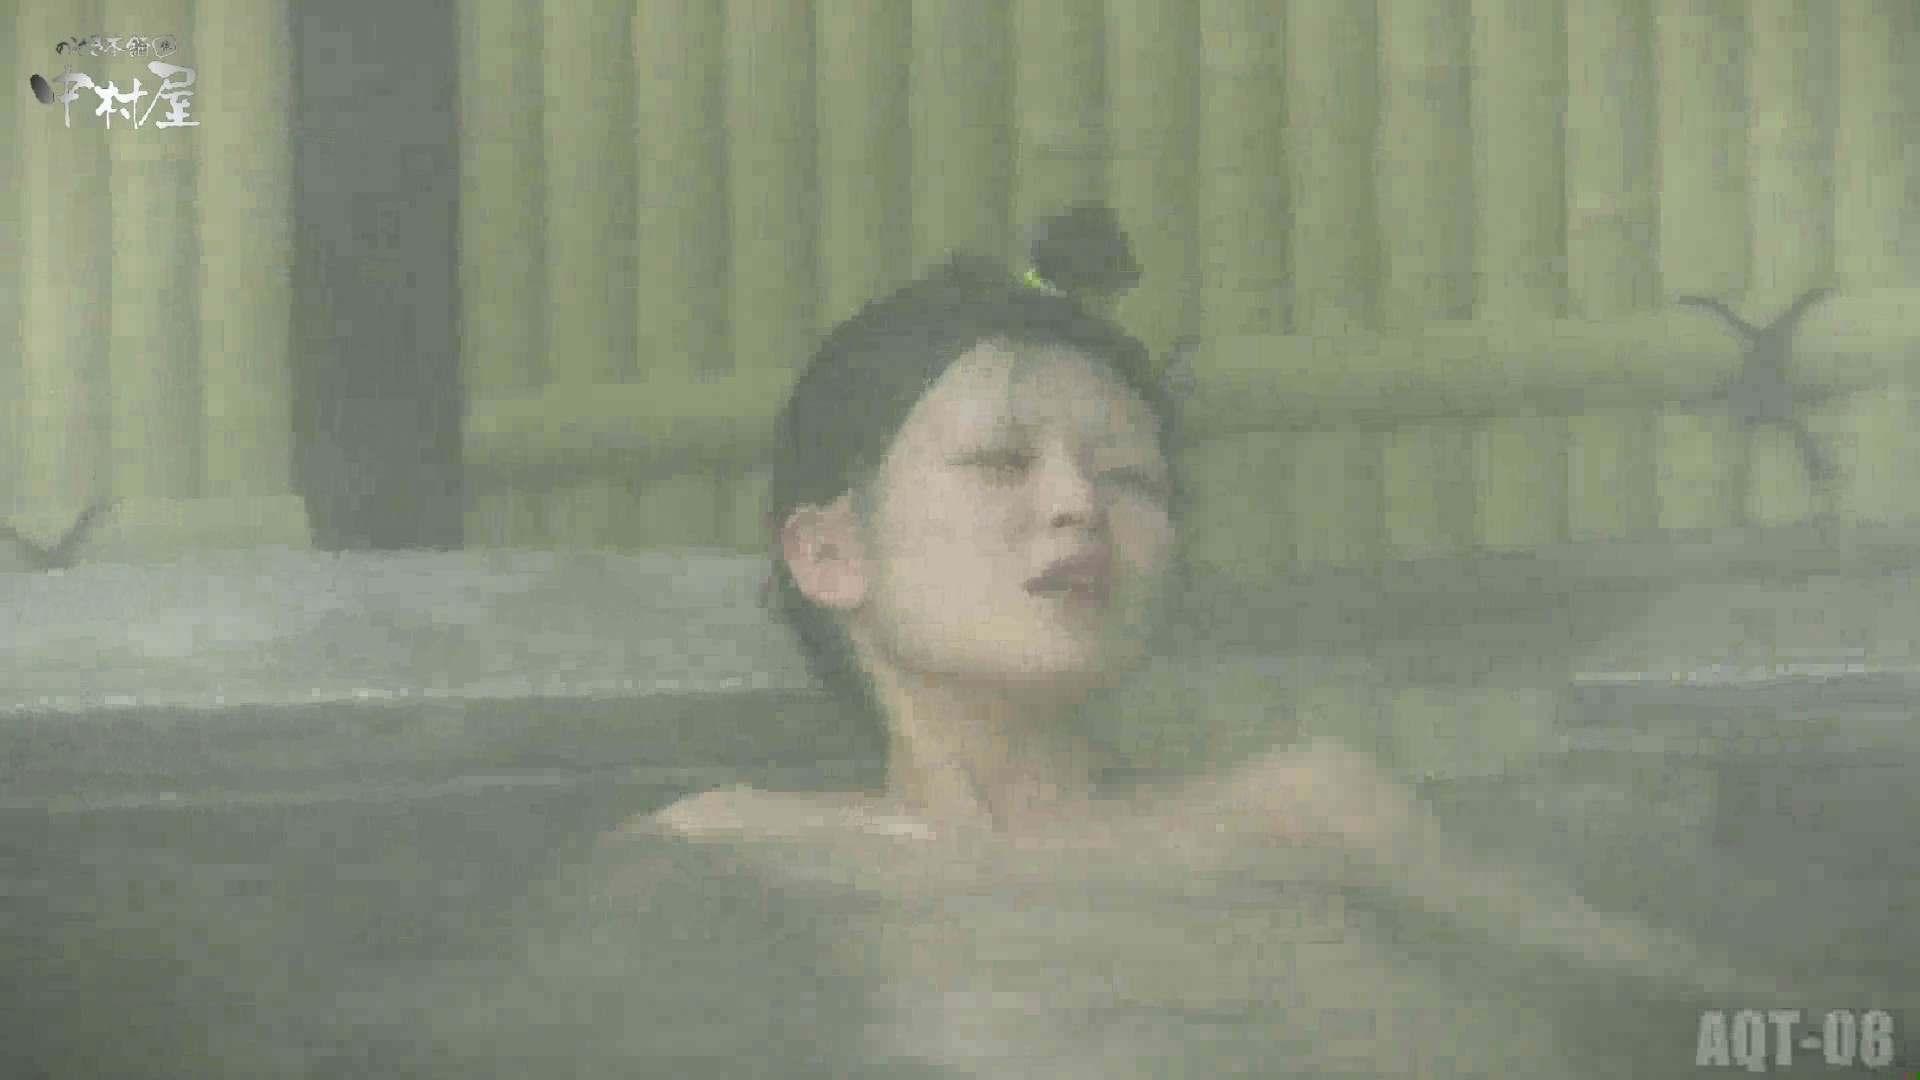 Aquaな露天風呂Vol.872潜入盗撮露天風呂八判湯 其の五 0  83pic 28